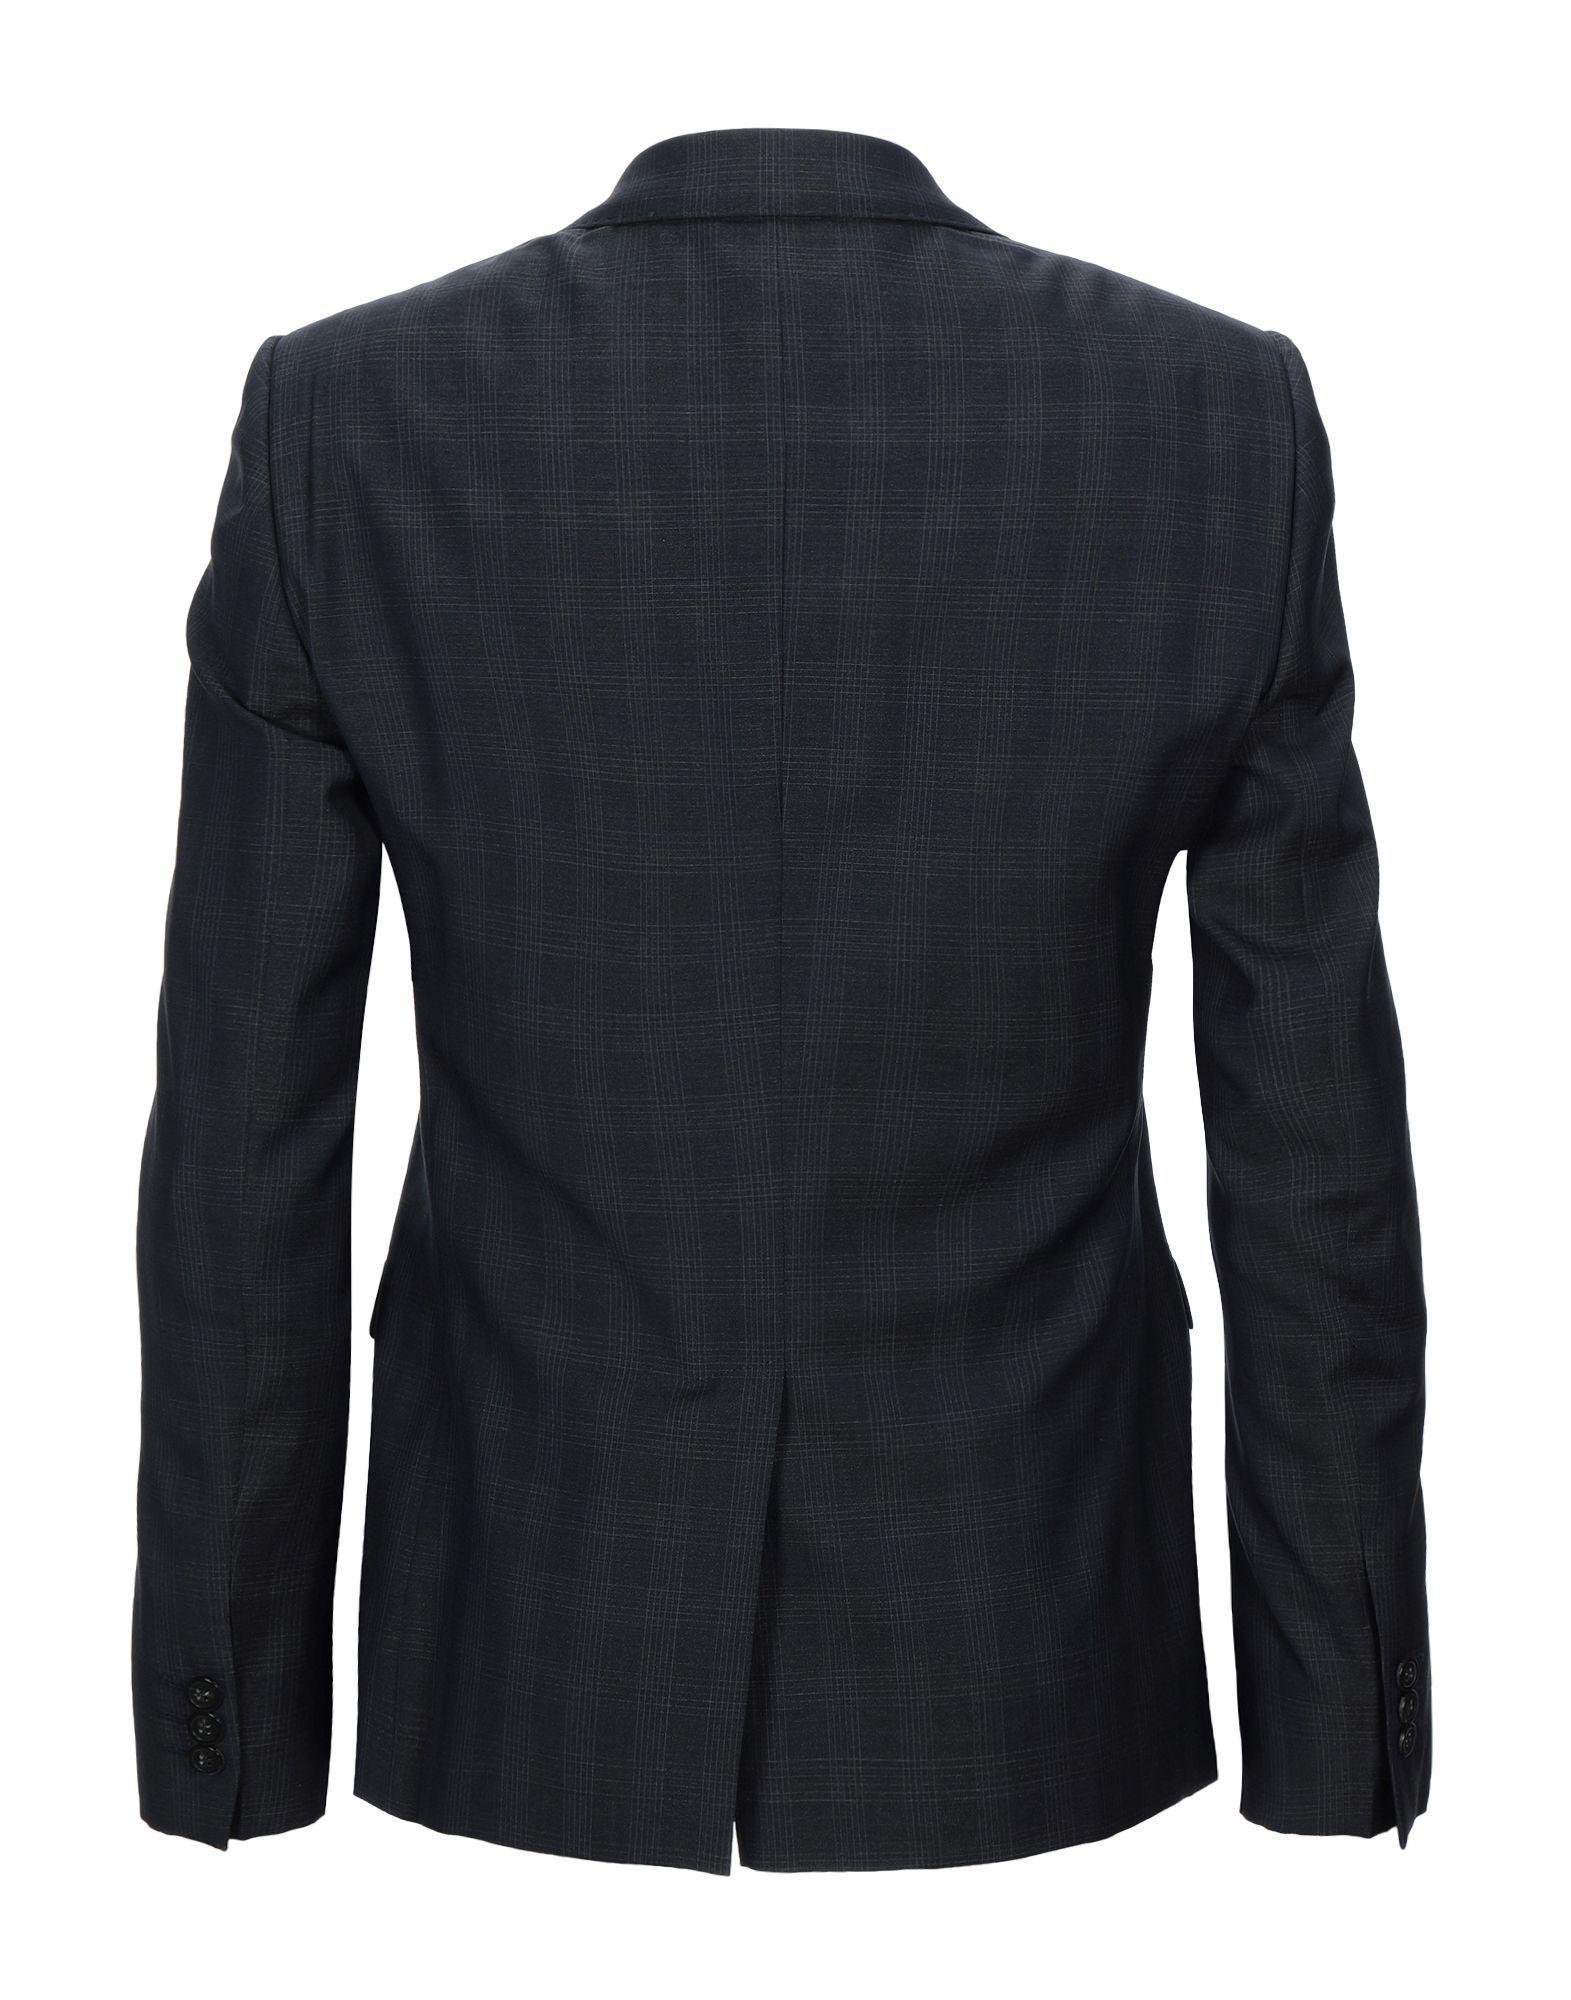 Emporio Armani Dark Blue Virgin Wool Single Breasted Jacket